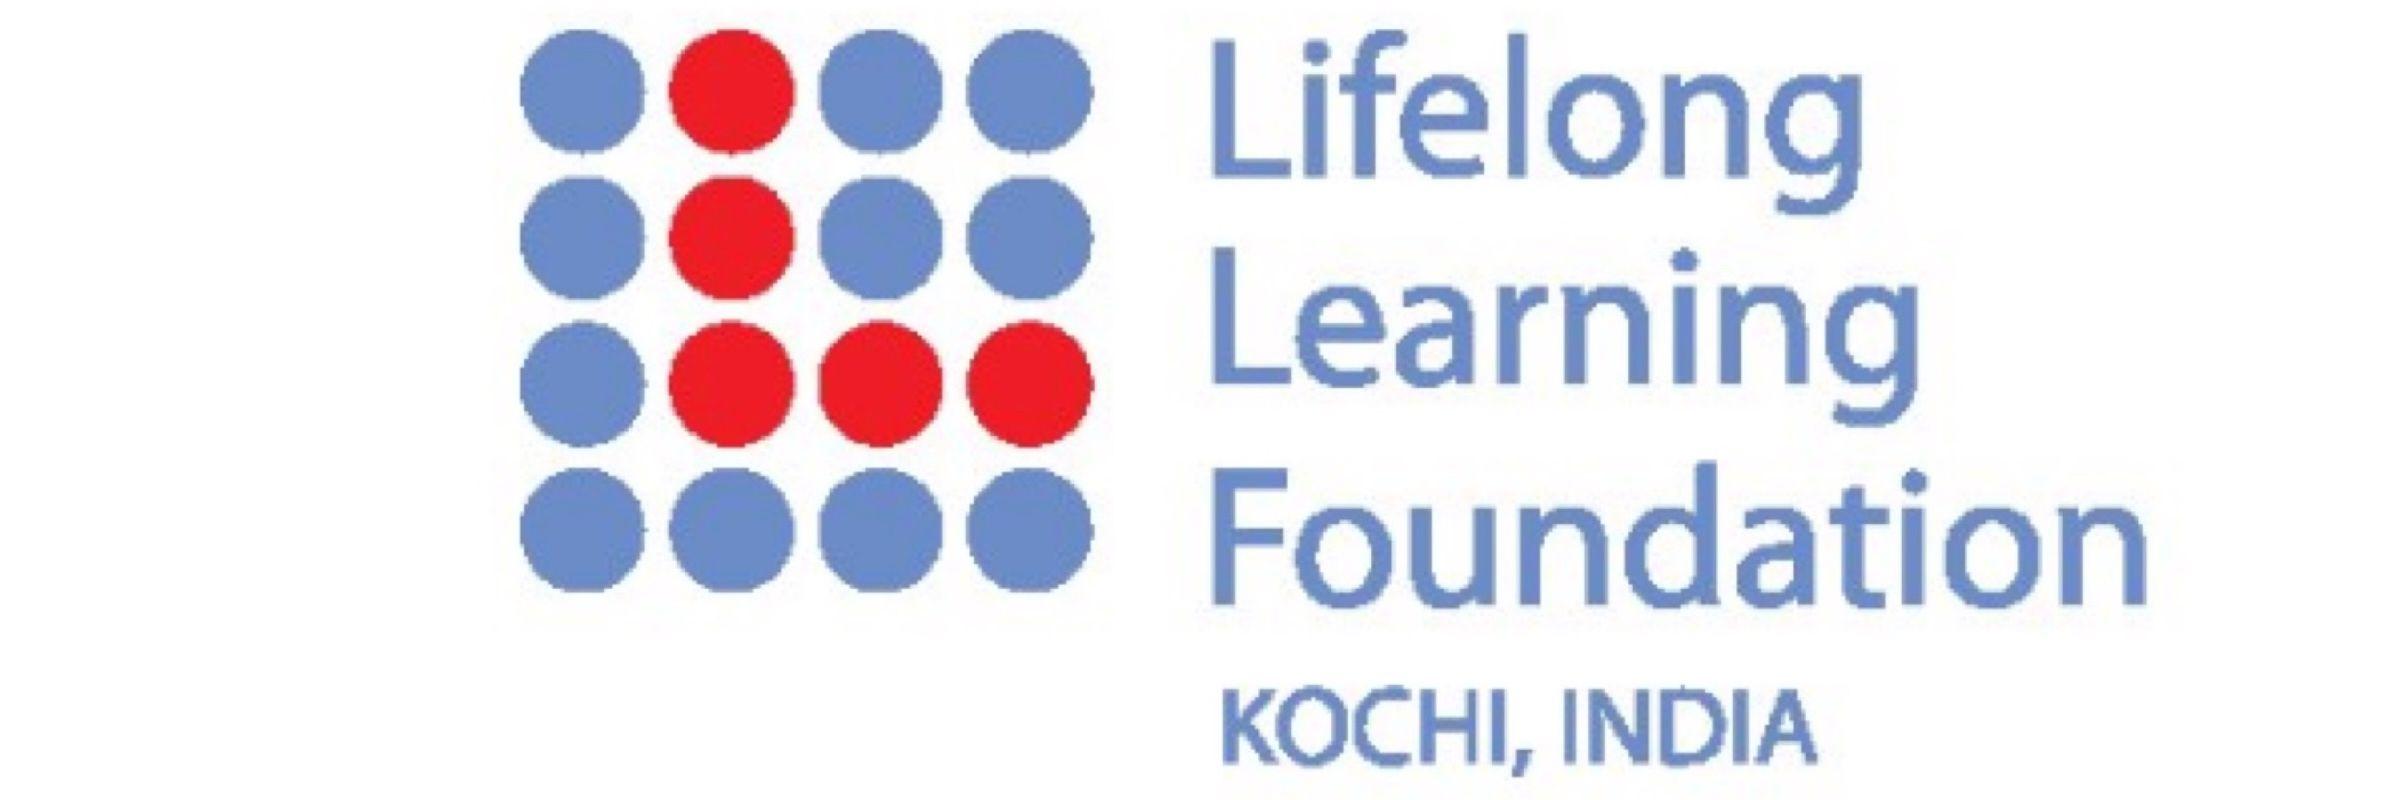 Lifelong Learning Foundation